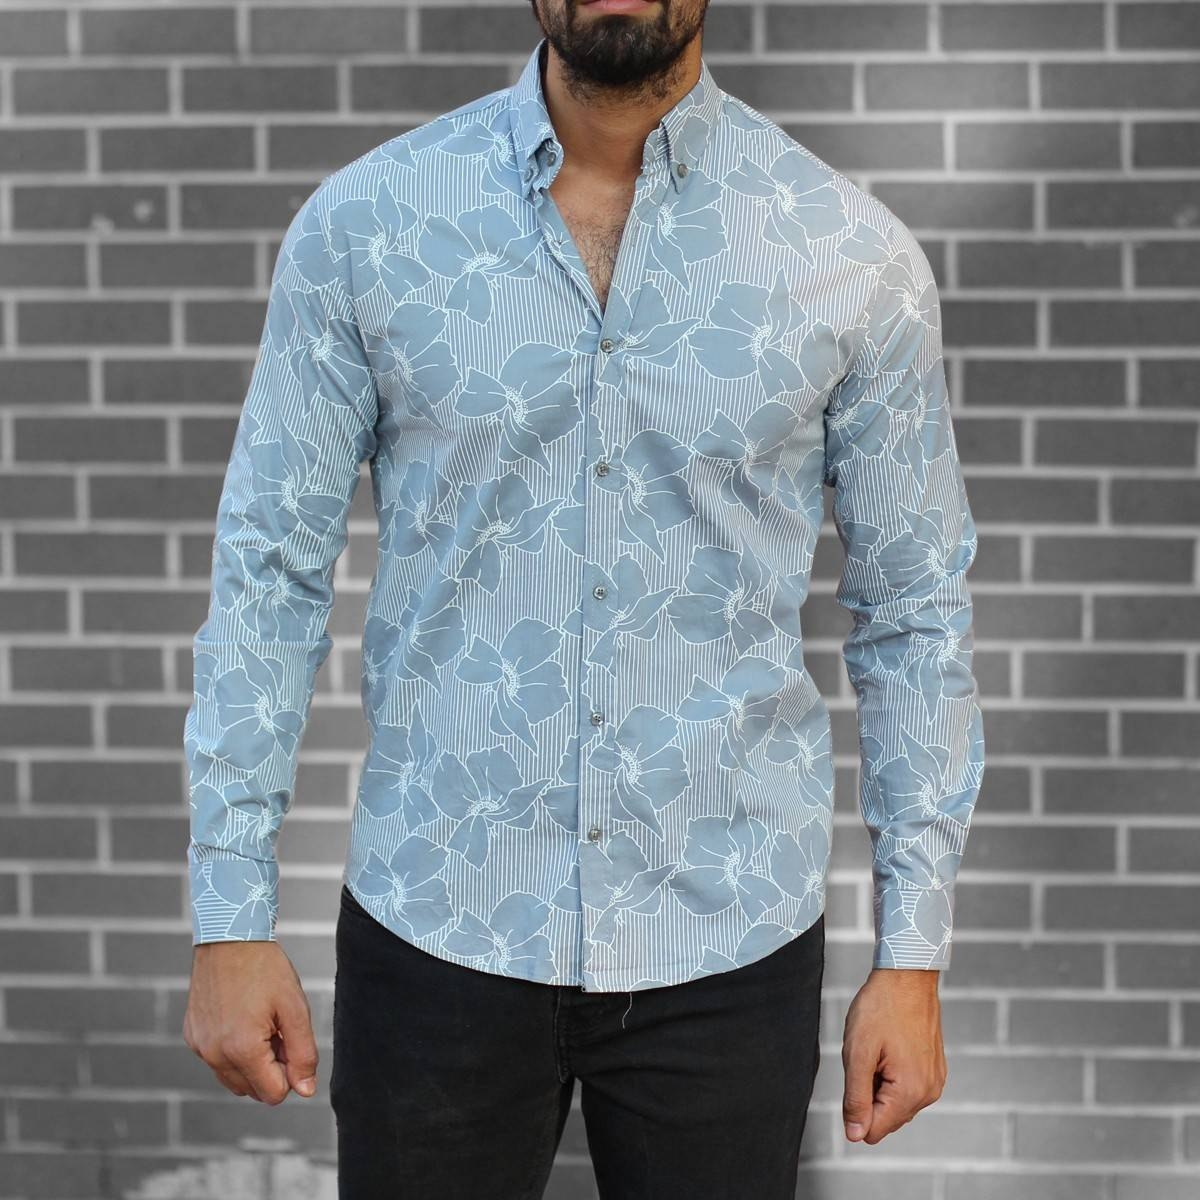 Men's Lyrca Blue&White Striped Shirt Mv Premium Brand - 1